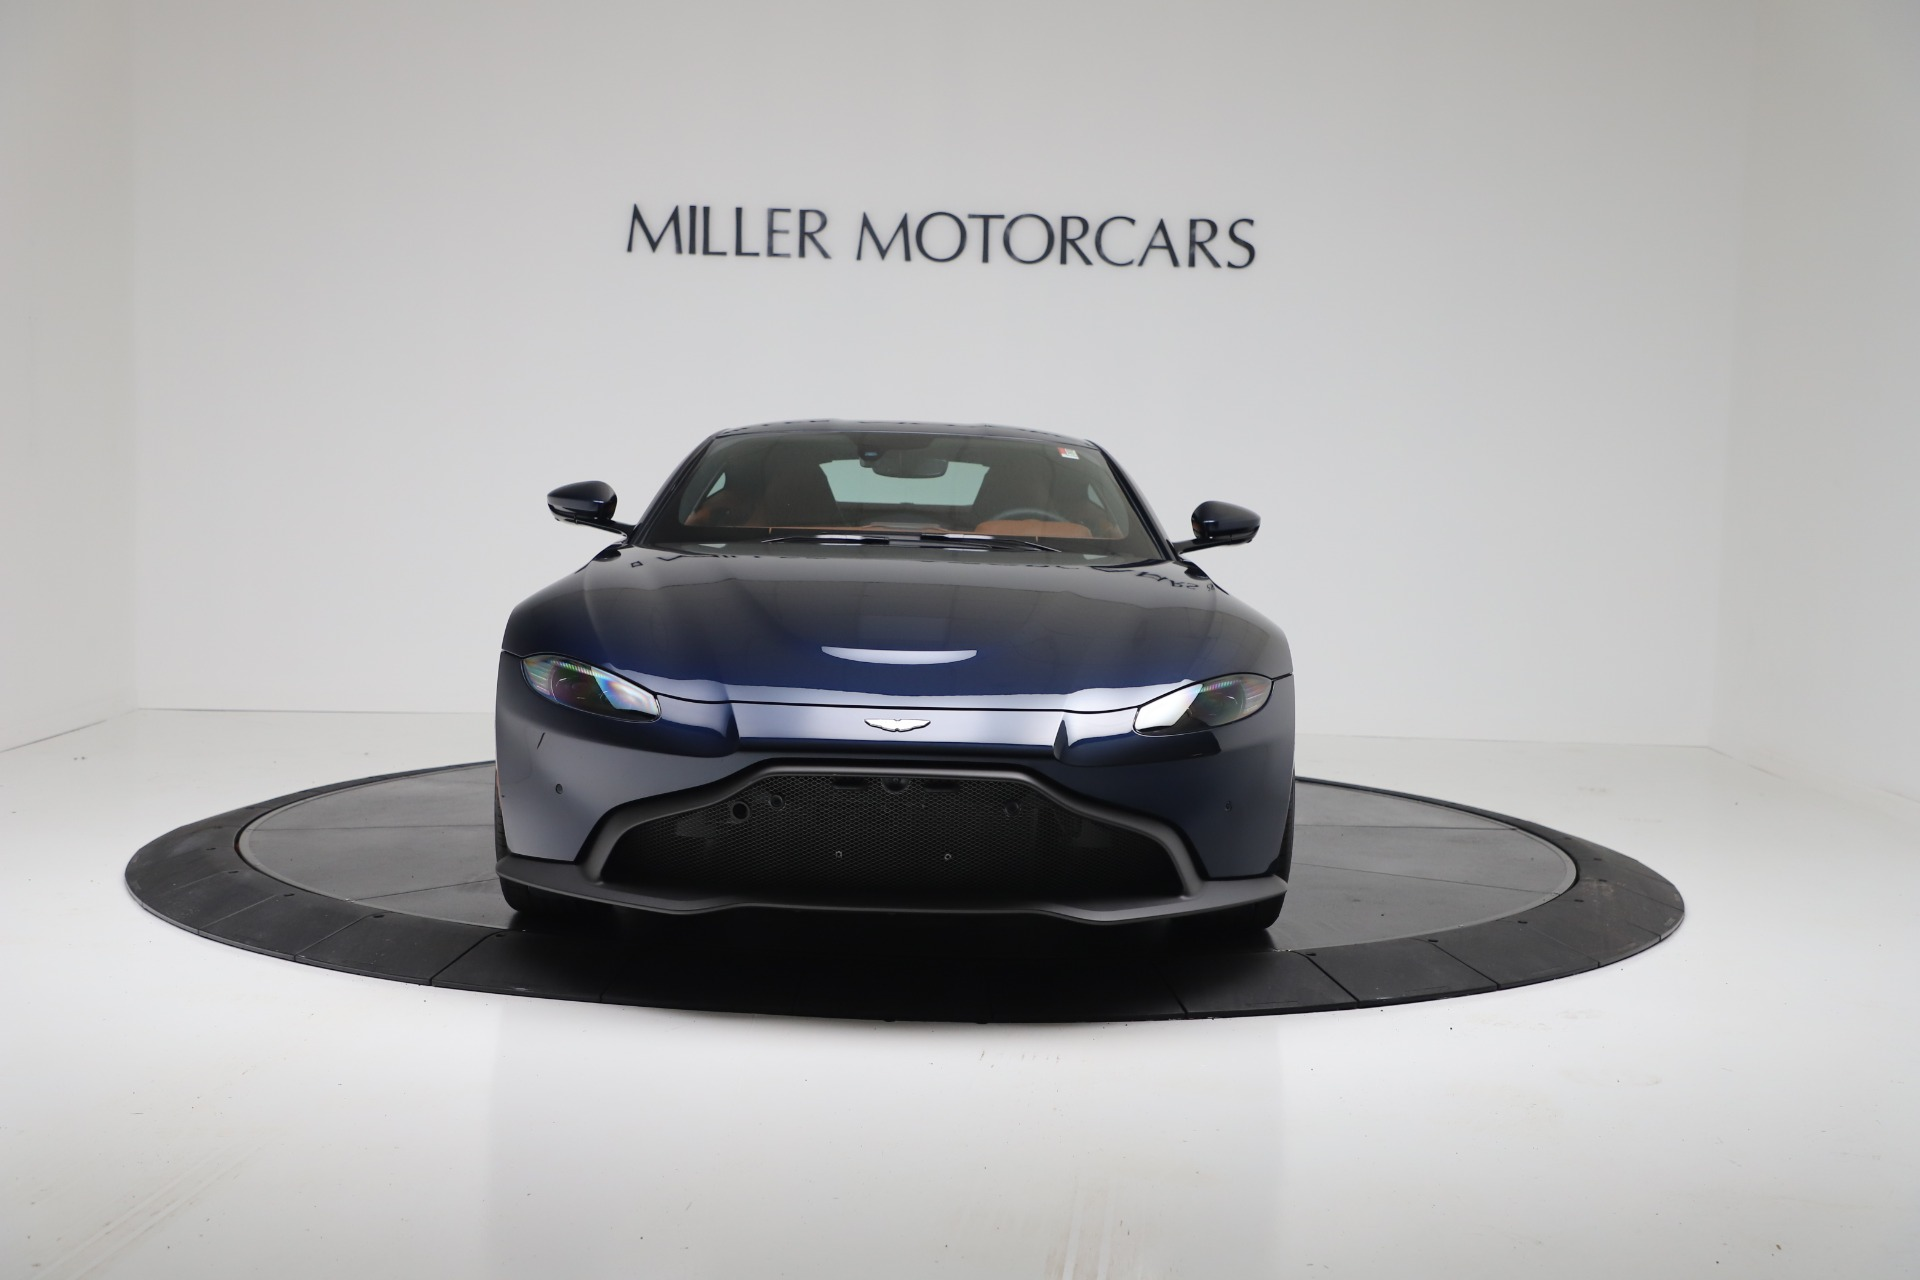 New 2020 Aston Martin Vantage V8 For Sale In Greenwich, CT 3378_p11